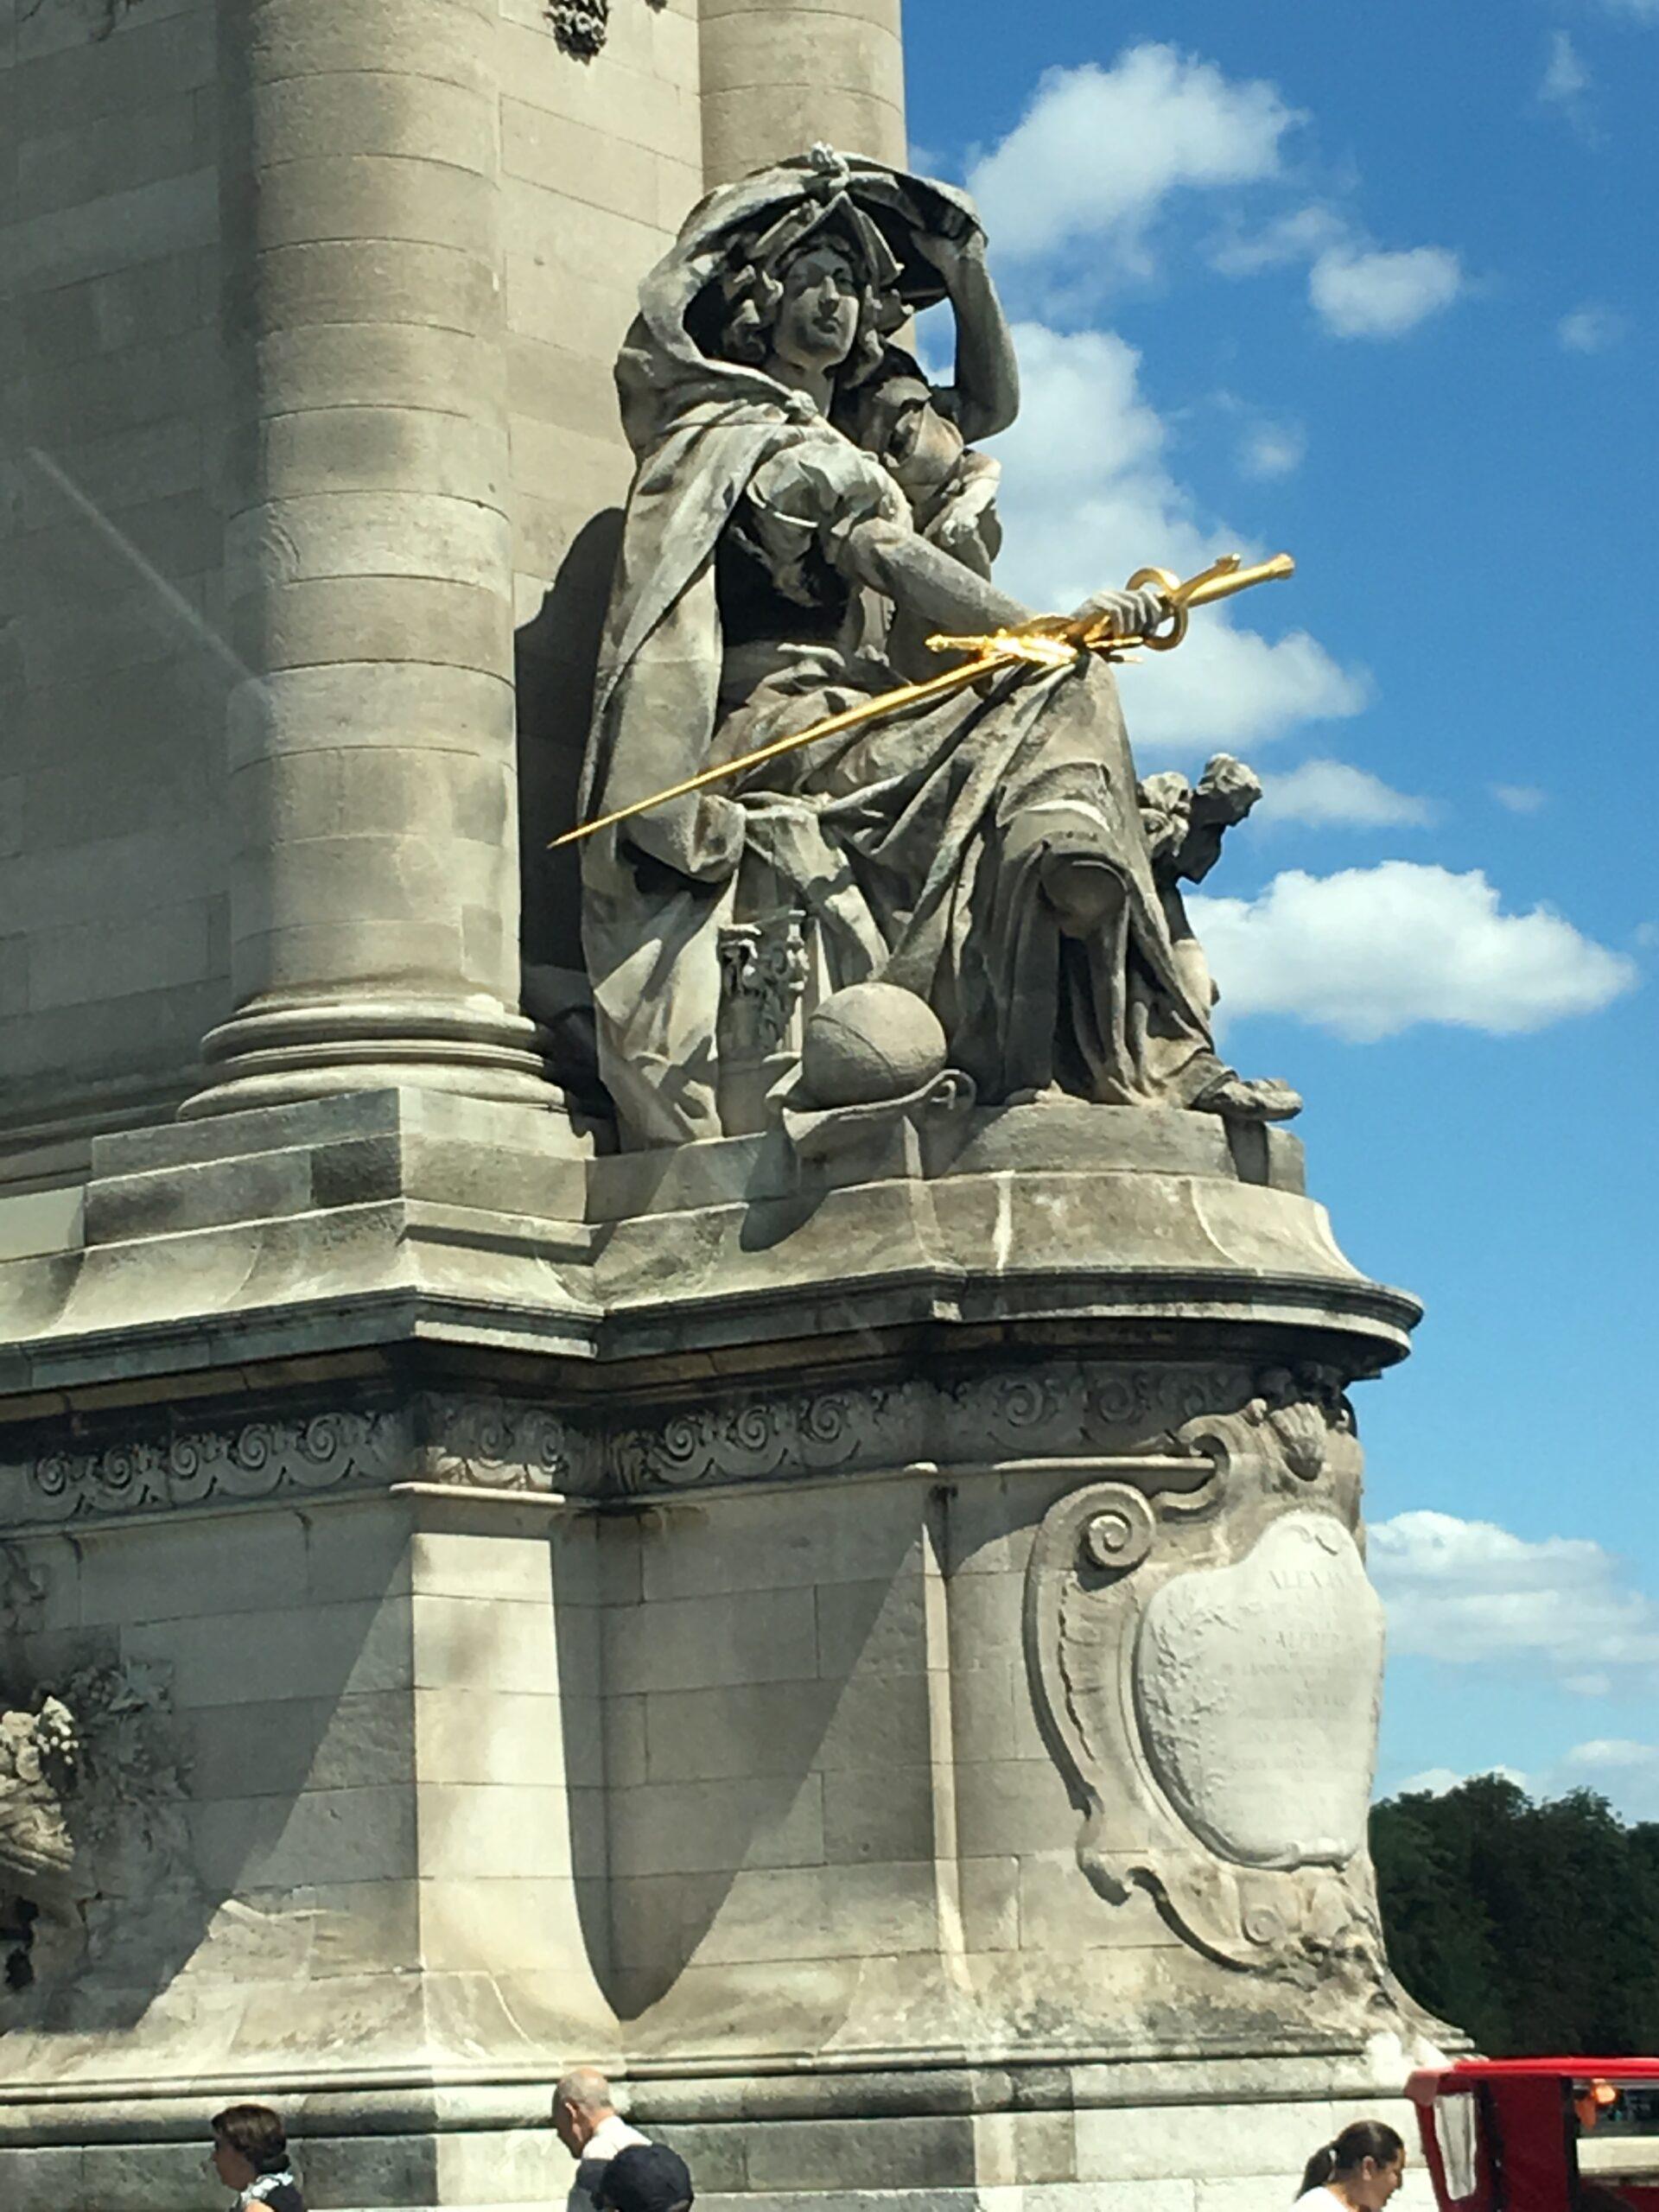 Statue of woman holding golden sword at Pont Alexandre III in Paris